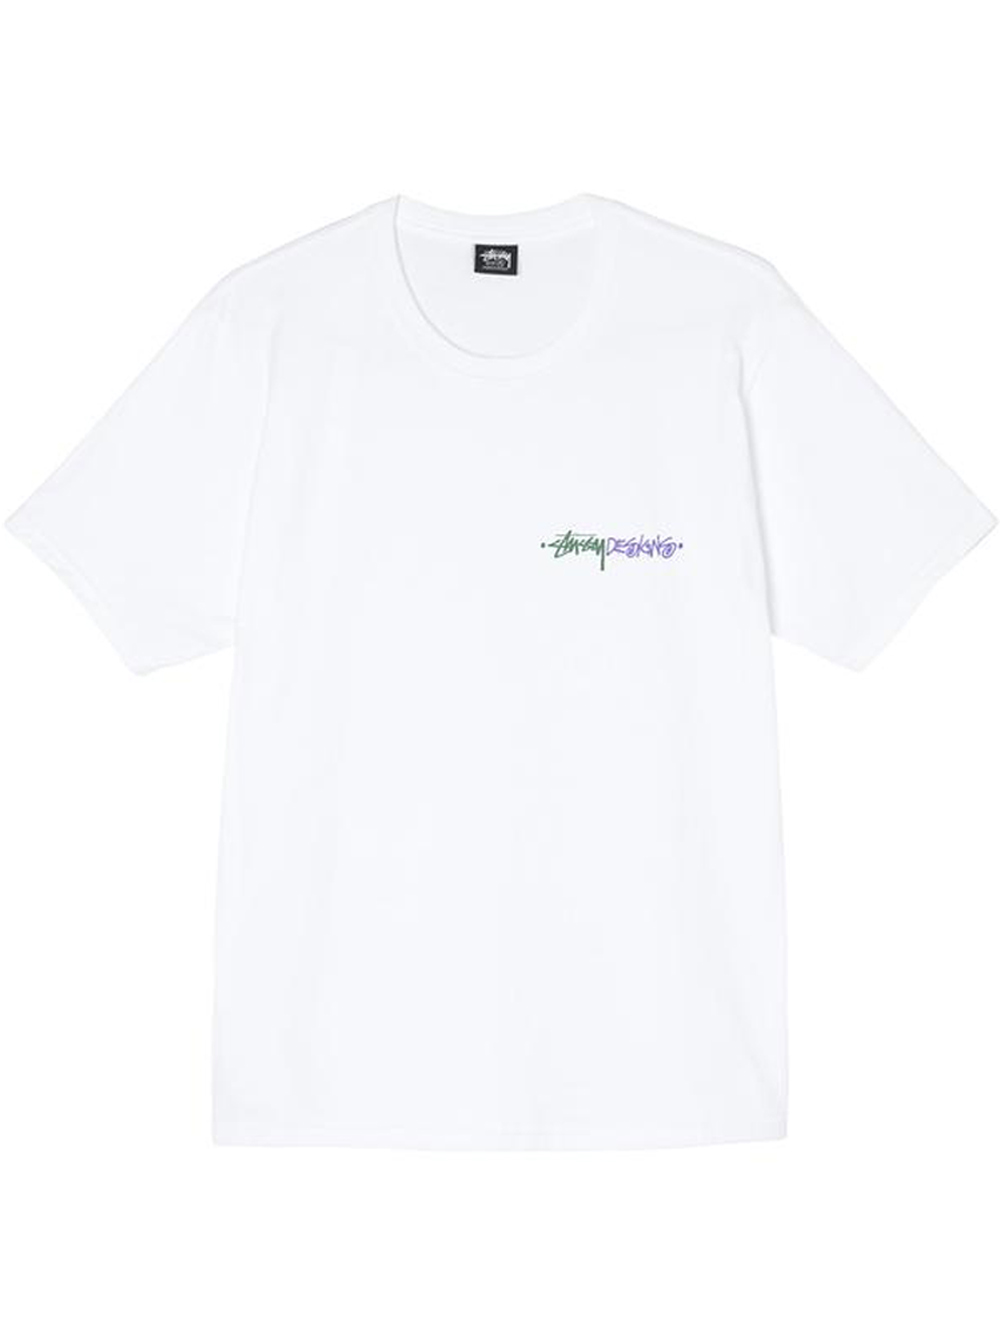 positive vibration t-shirt man white in cotton STUSSY | T-shirts | 1904711WHITE